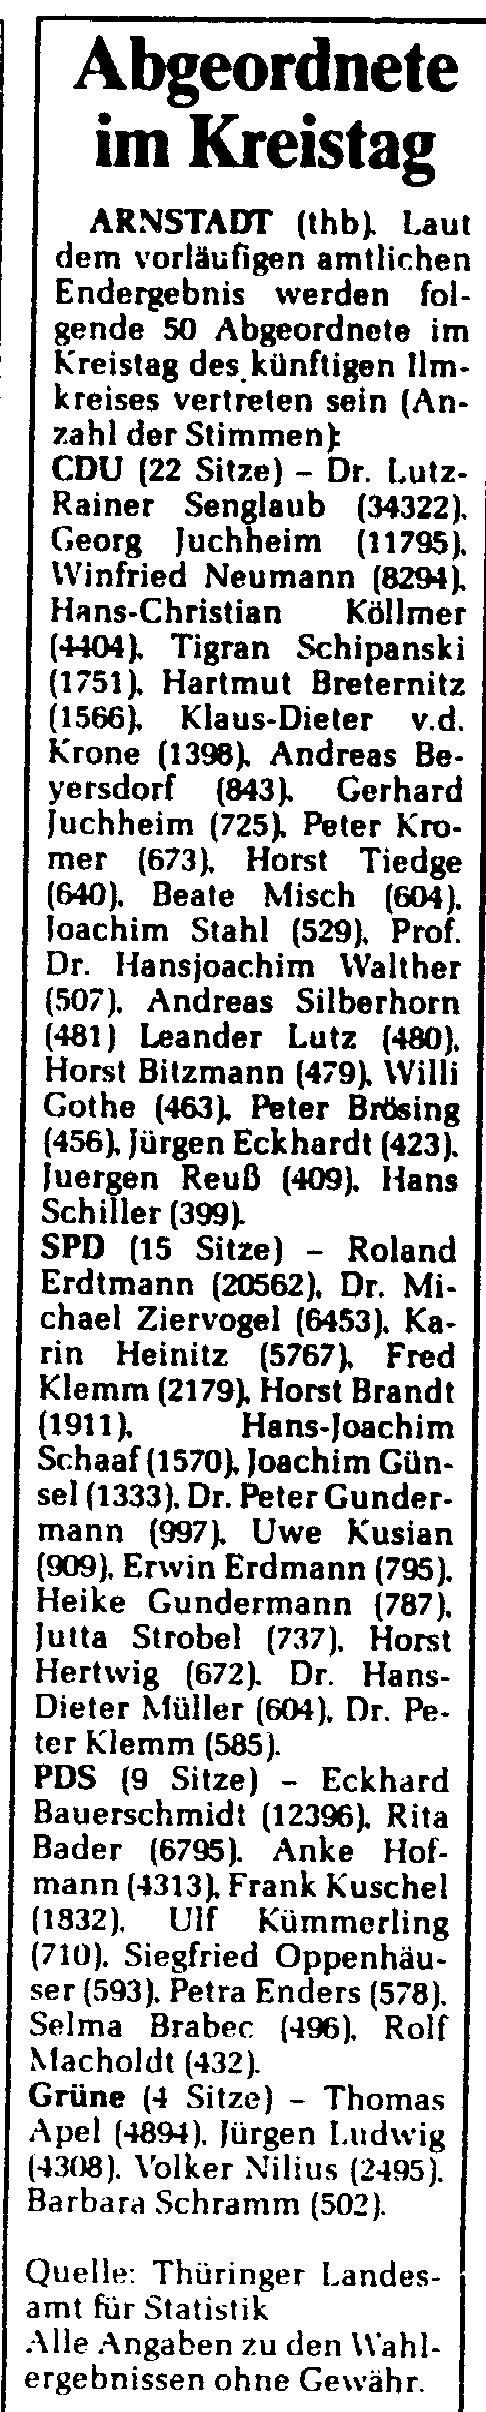 15-06-94 Abgeordnete Kreistag109